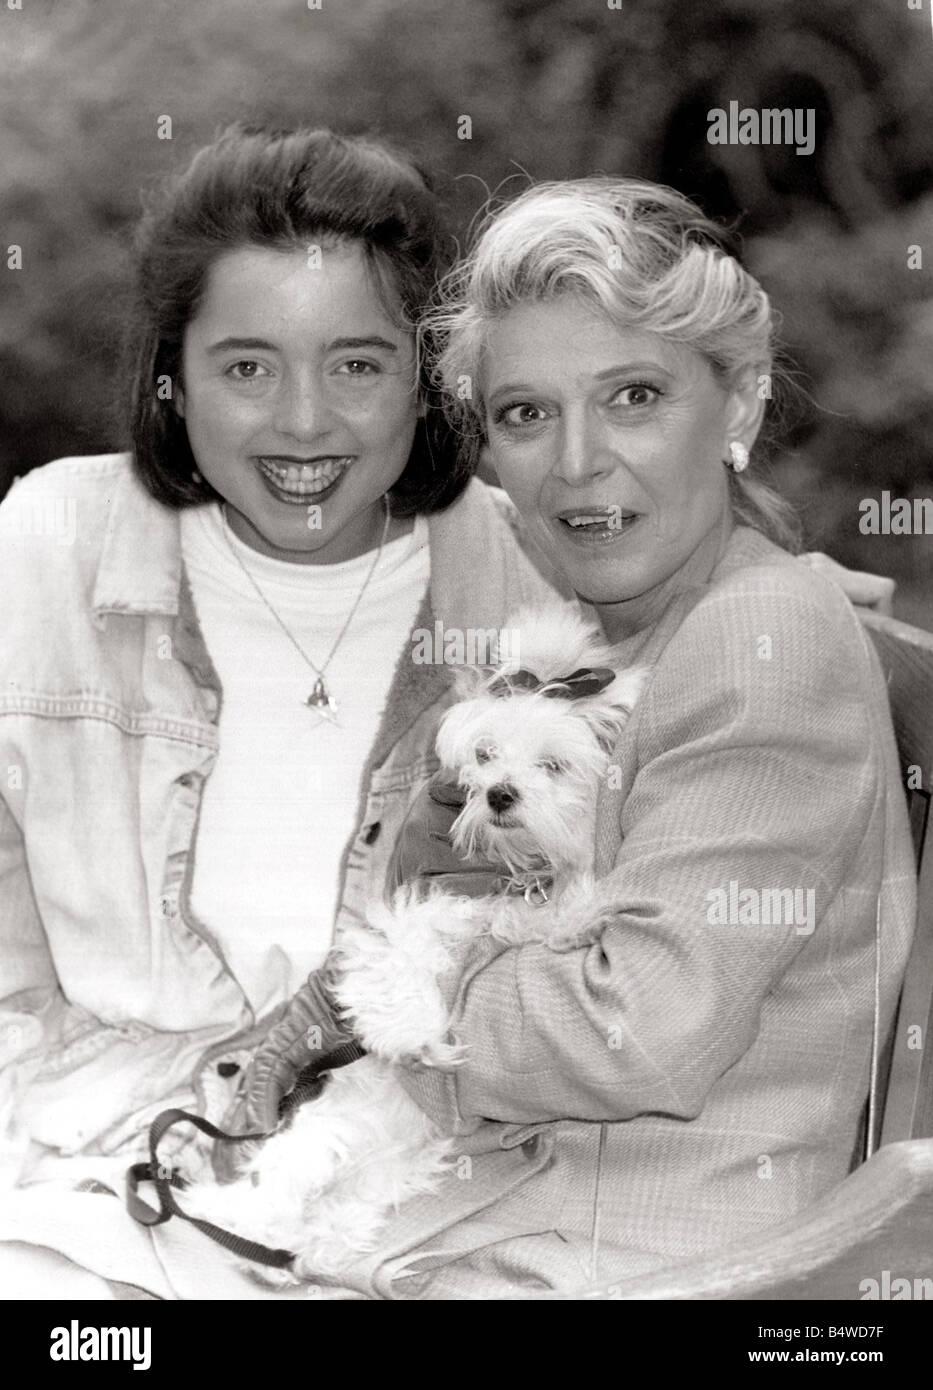 Forum on this topic: Jane Elliot born January 17, 1947 (age 71), charlotte-coleman/